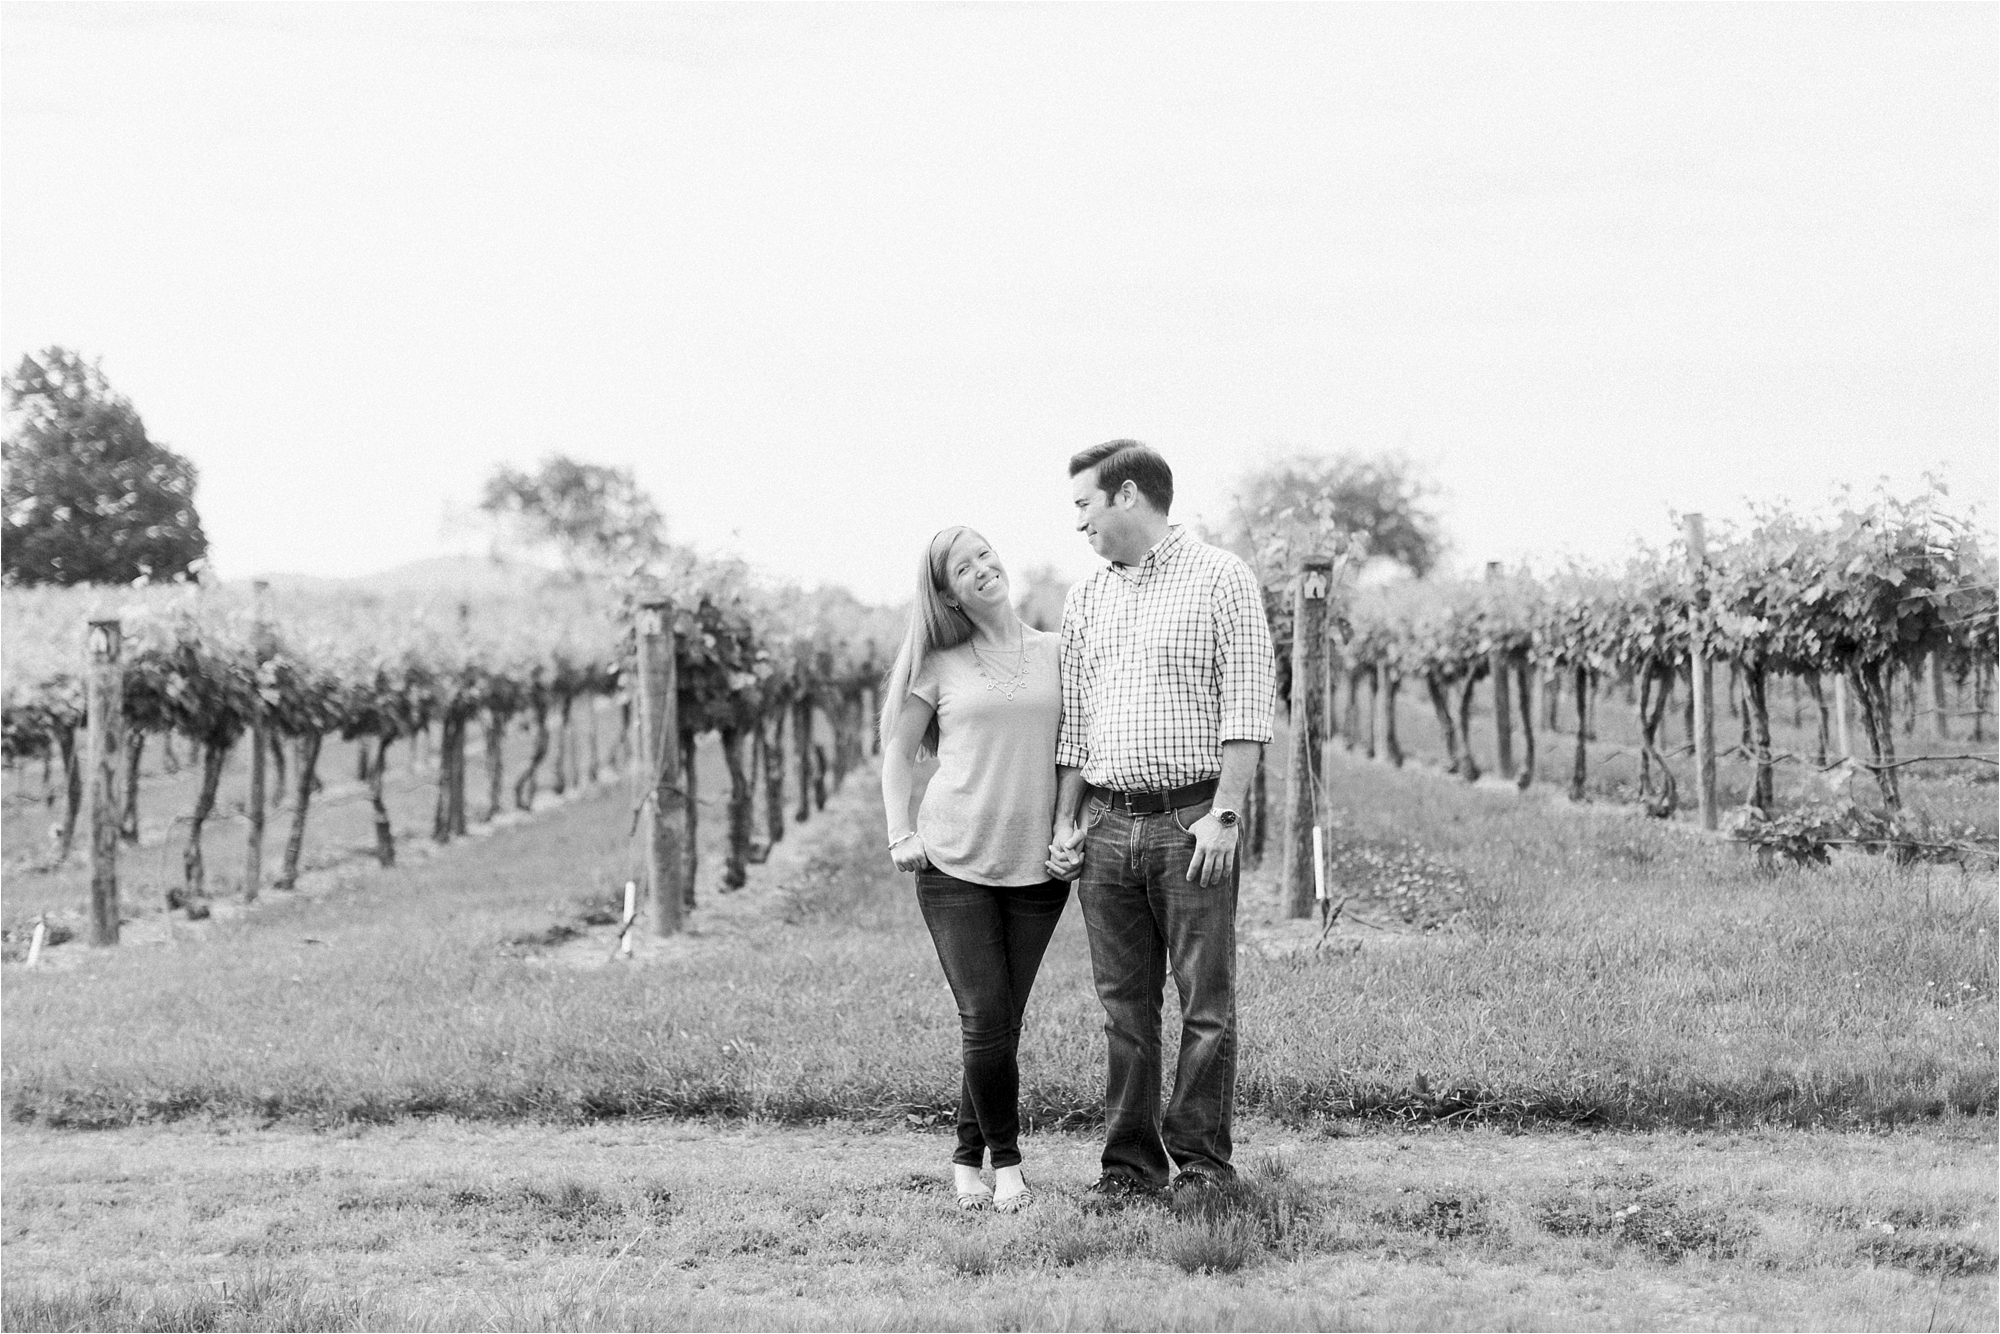 stephanie-yonce-vertias-winery-engagement-photo_0003.jpg